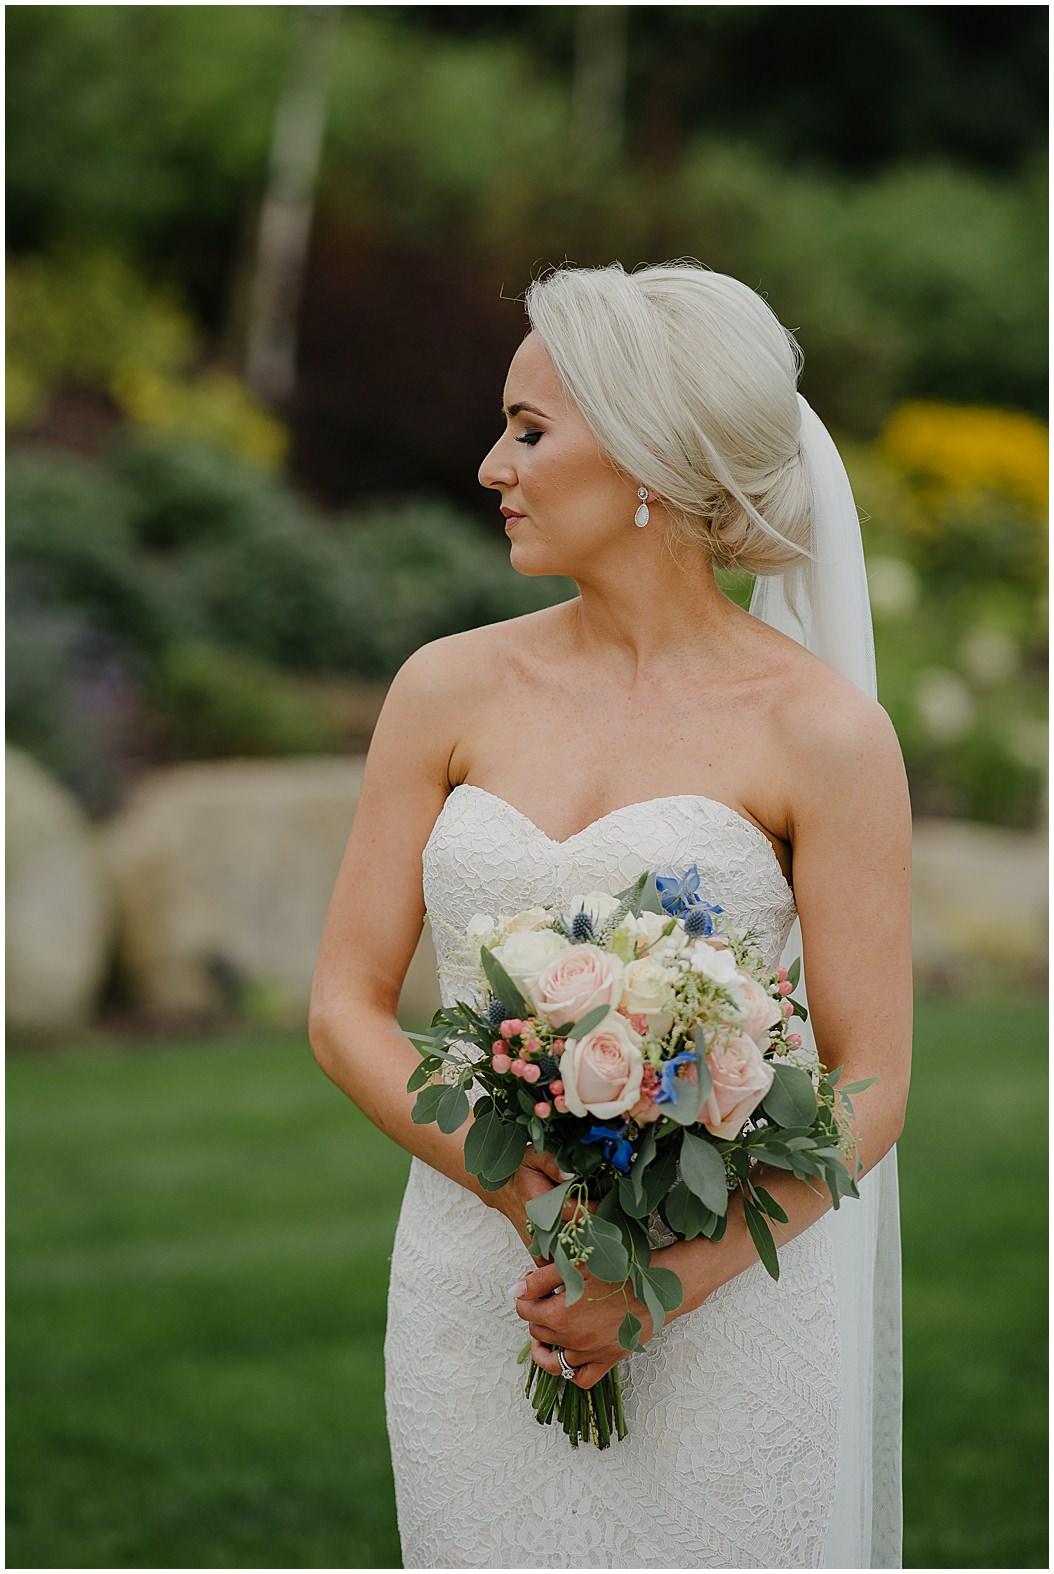 tempo-manor-wedding-jude-browne-photography_0128.jpg